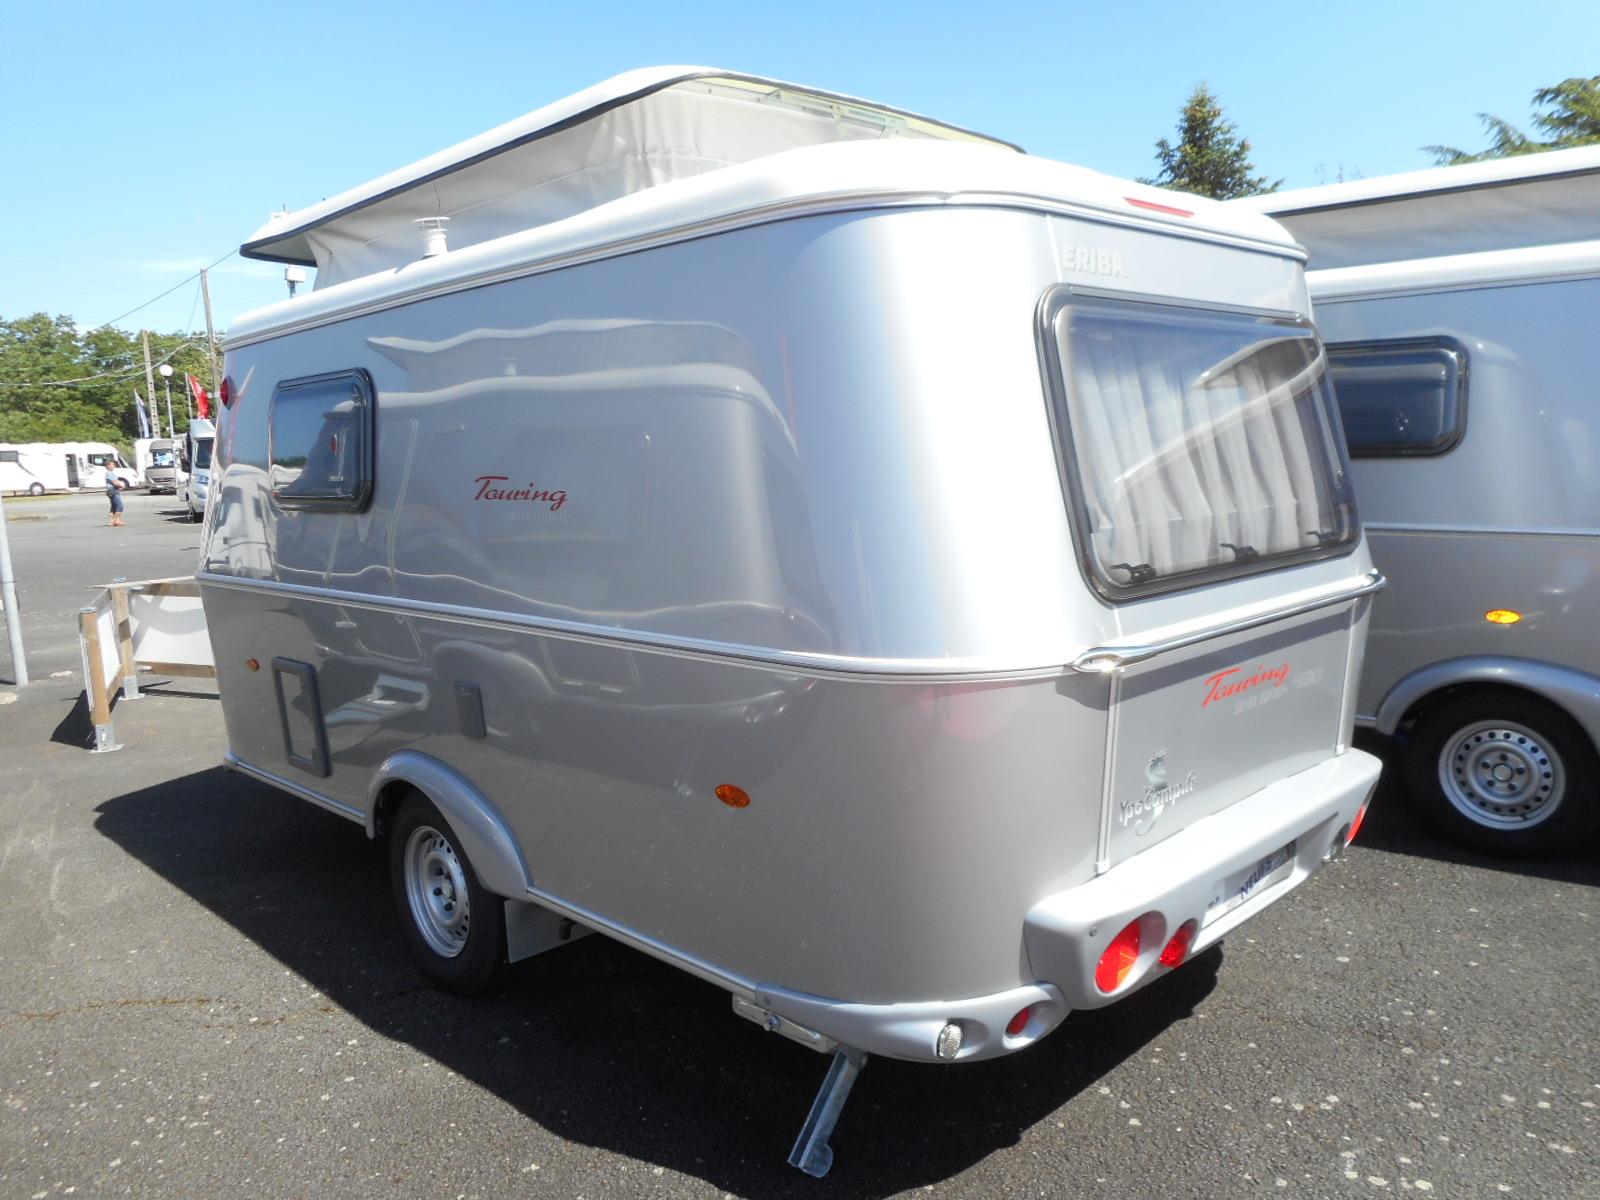 eriba triton 430 silver edition occasion caravane en vente rochefort charente maritime 17. Black Bedroom Furniture Sets. Home Design Ideas